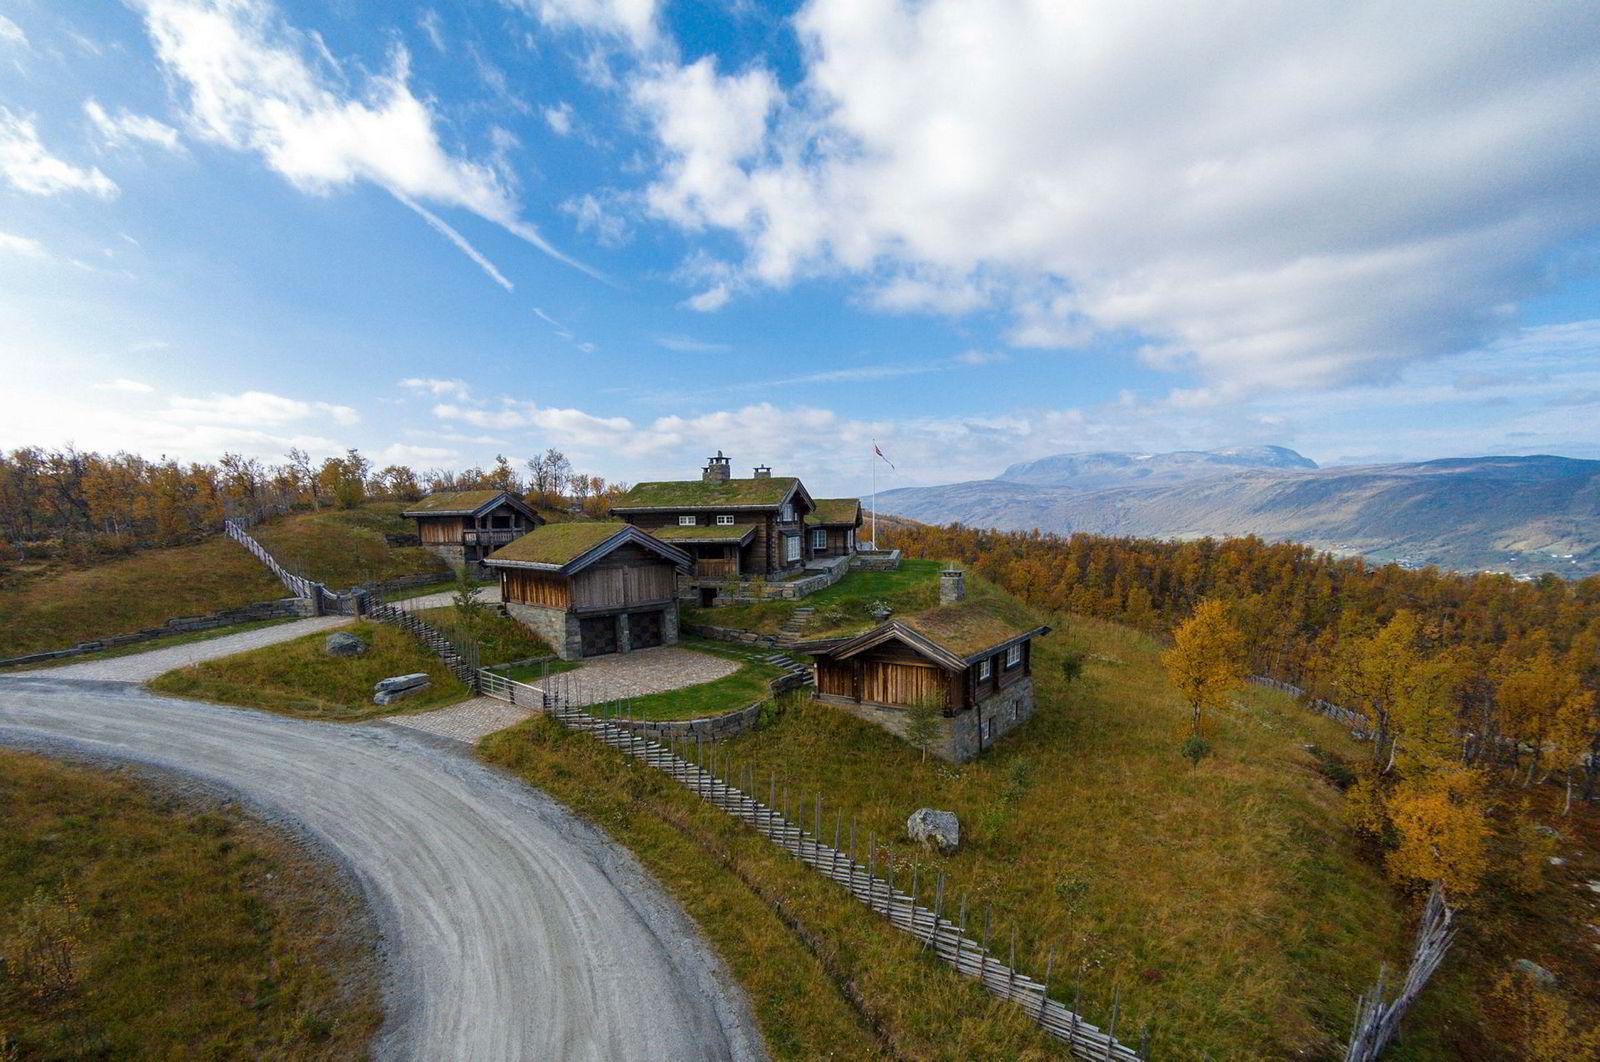 Geilo-hytta som Aage Thoresen ga 44 millioner kroner for tidligere i høst har et boareal på 780 kvadratmeter.